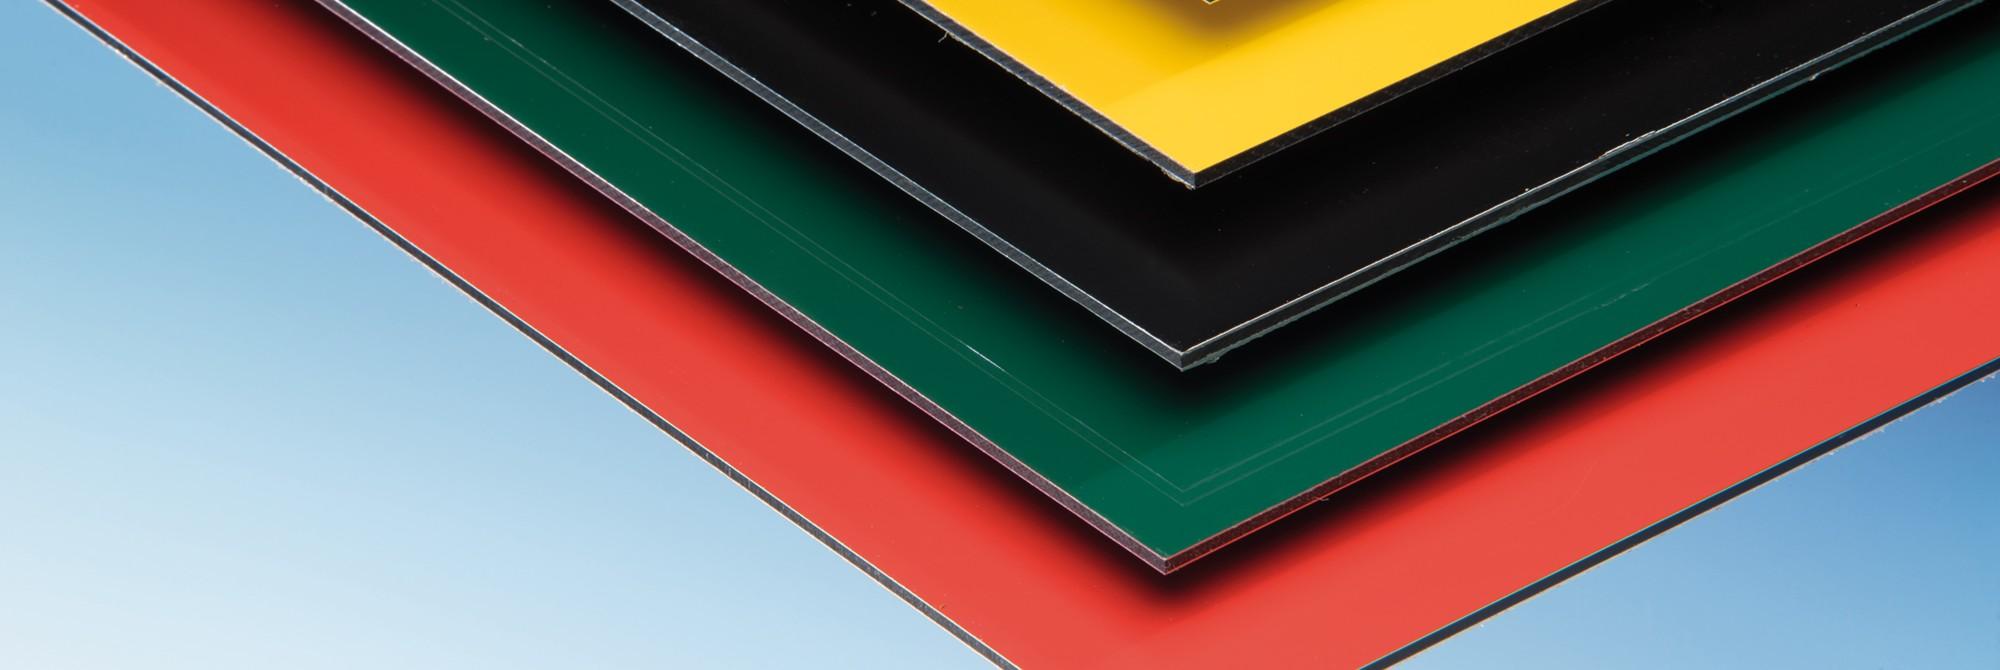 Full Size of Alu Verbundplatten Acm Und Bleche Wohnzimmer Easywall Alu Verbundplatte